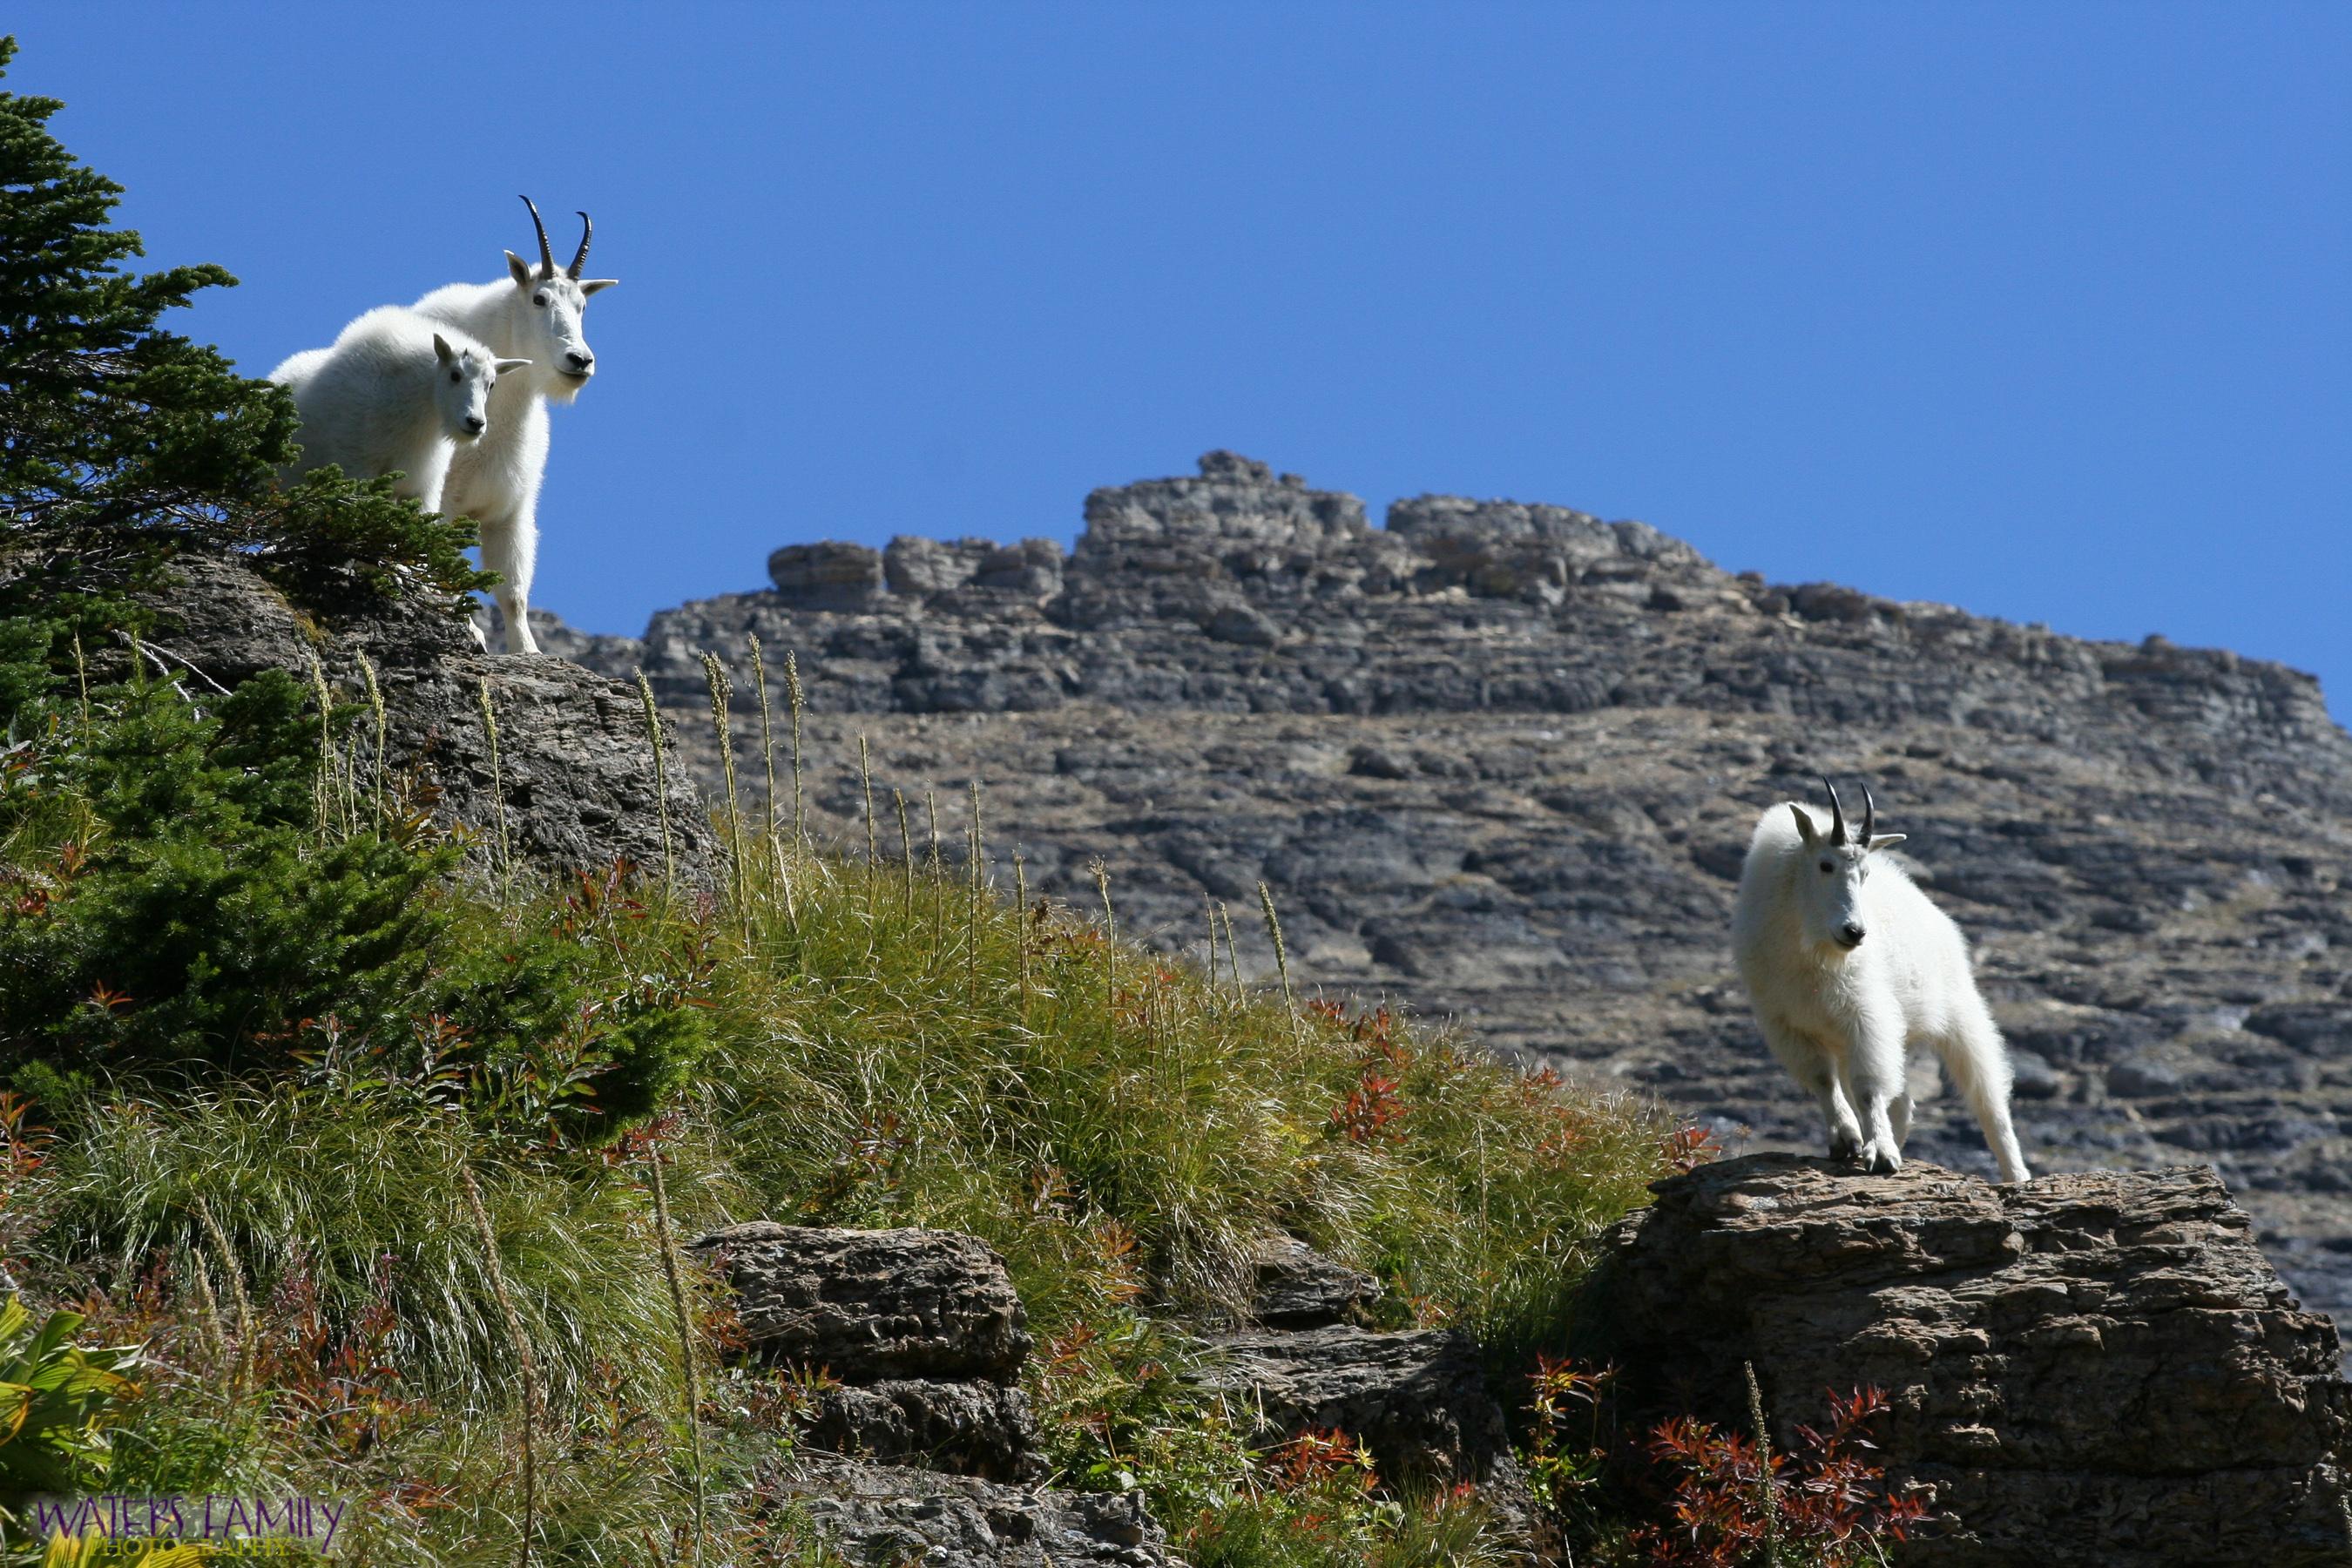 Billy Goat's Gruff